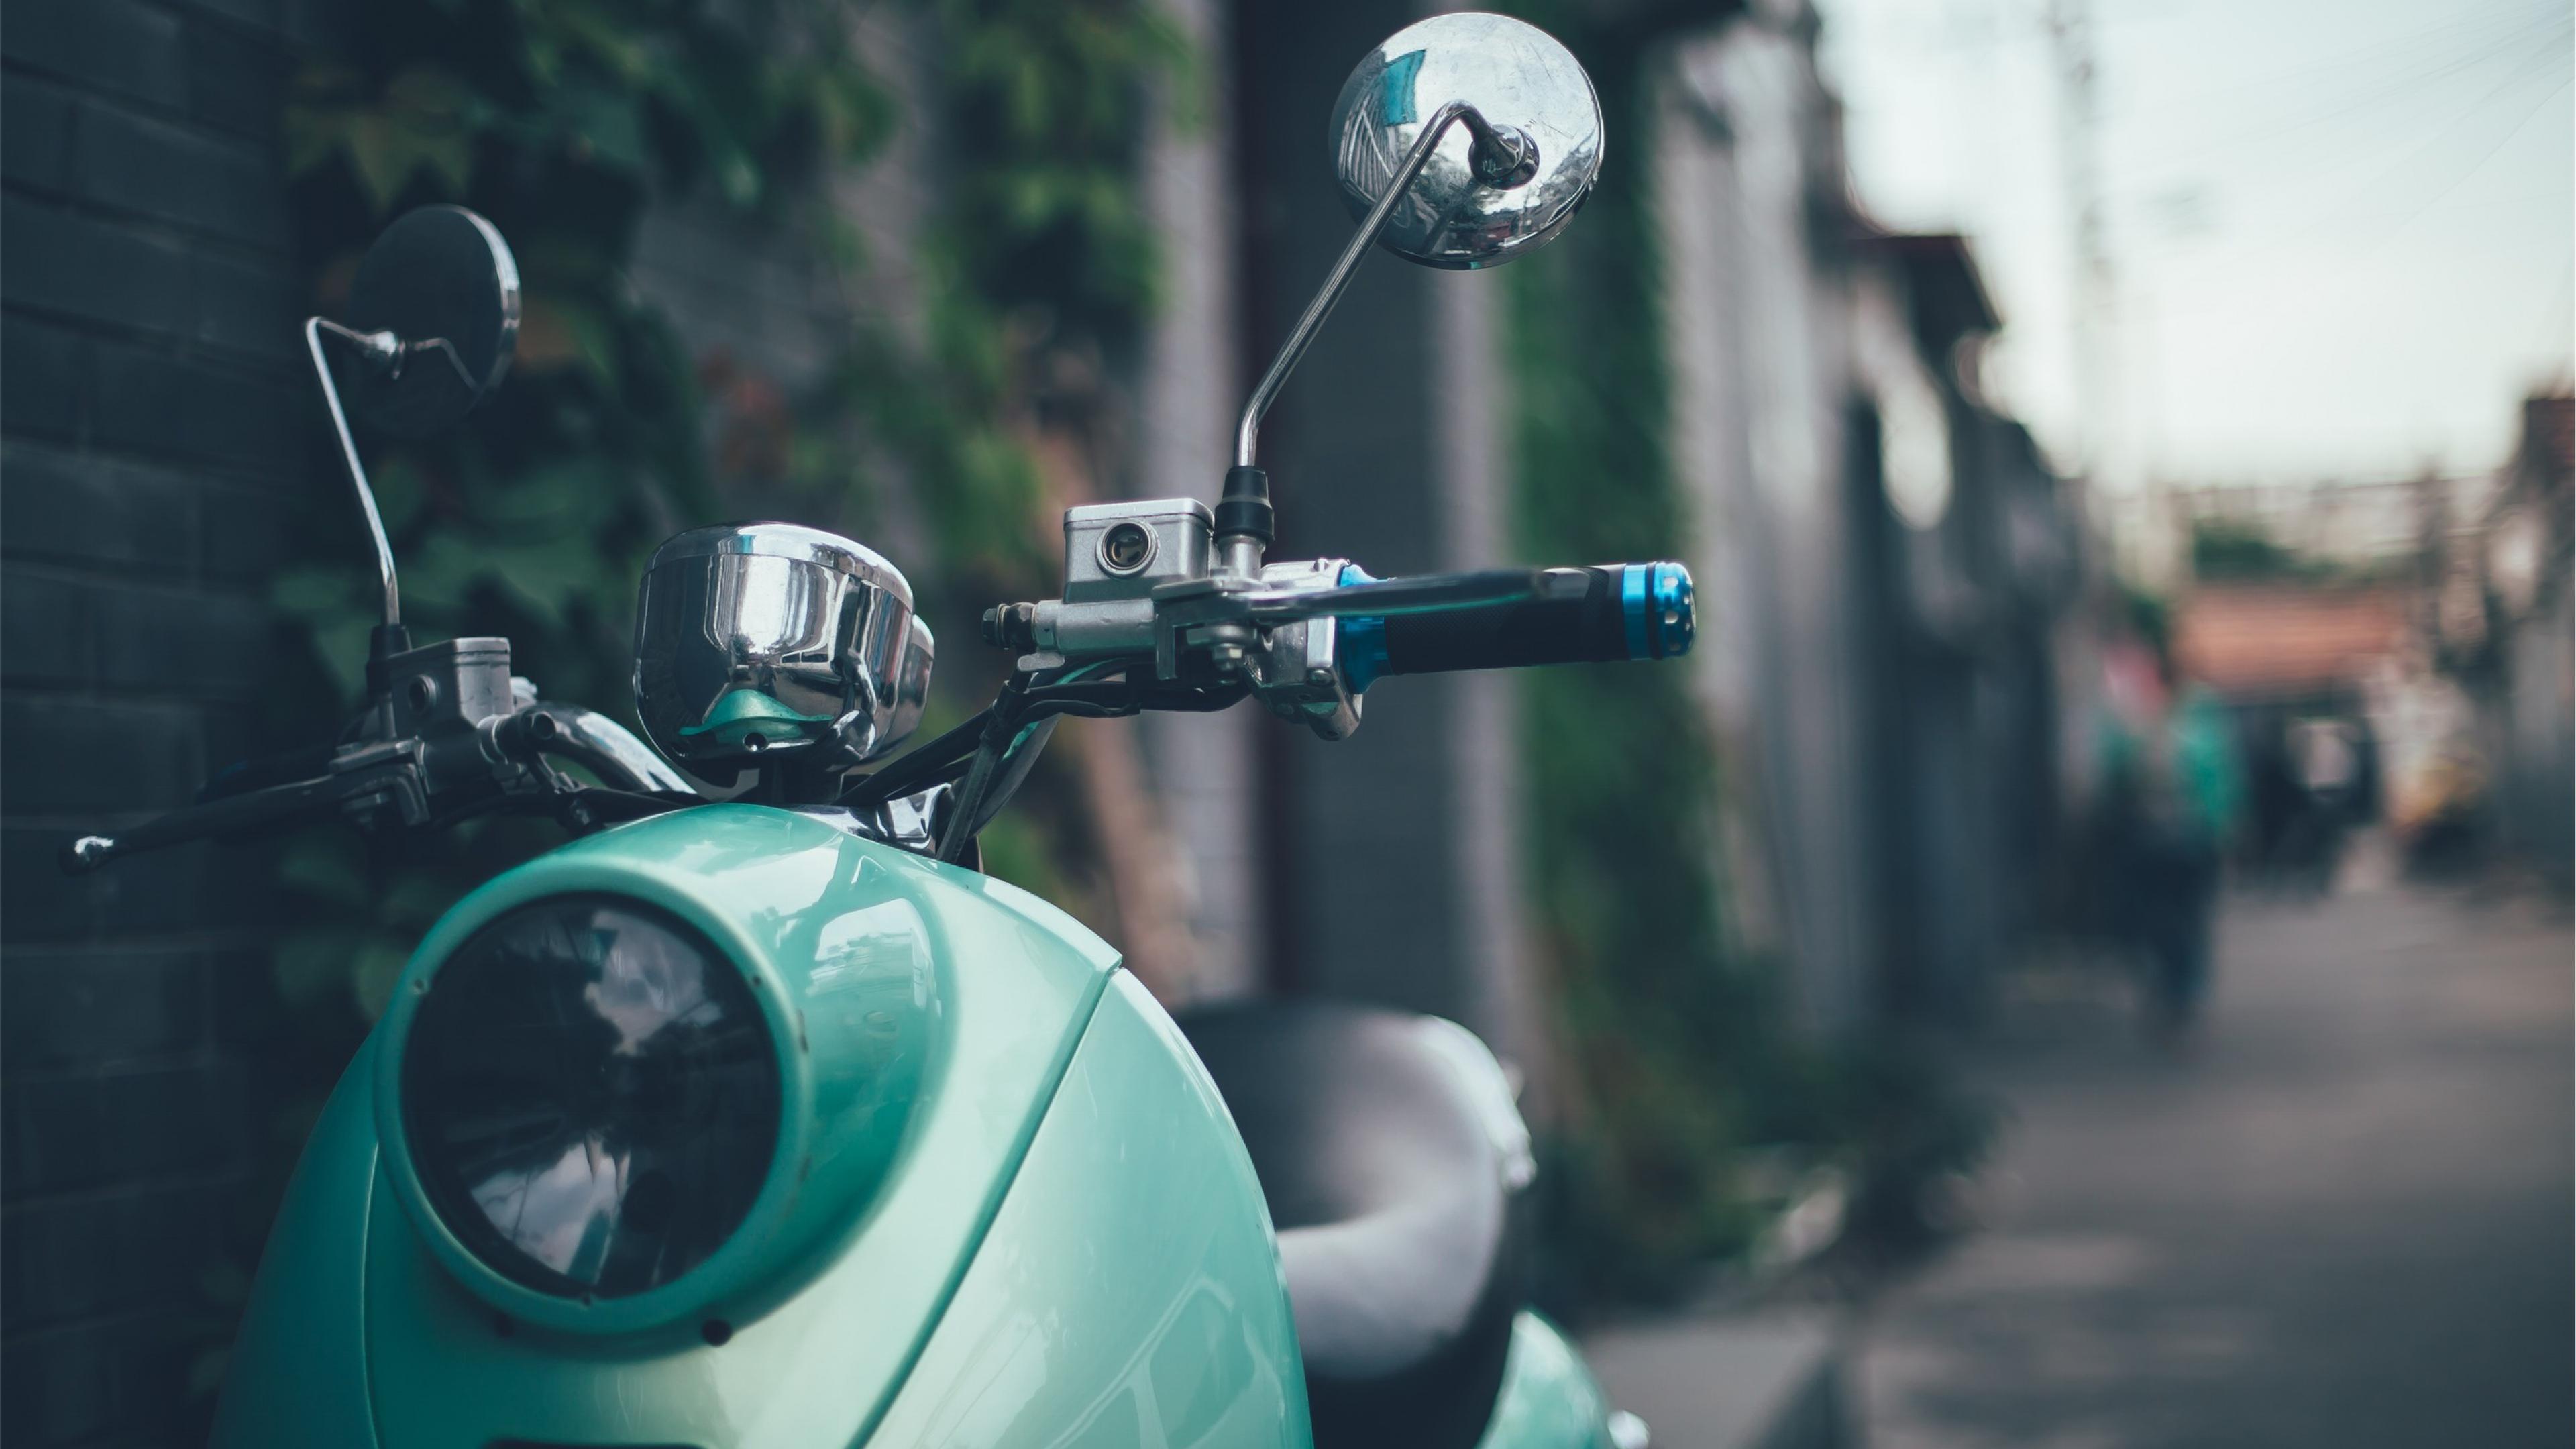 Vespa Scooter Vintage, HD Bikes, 4k Wallpapers, Images